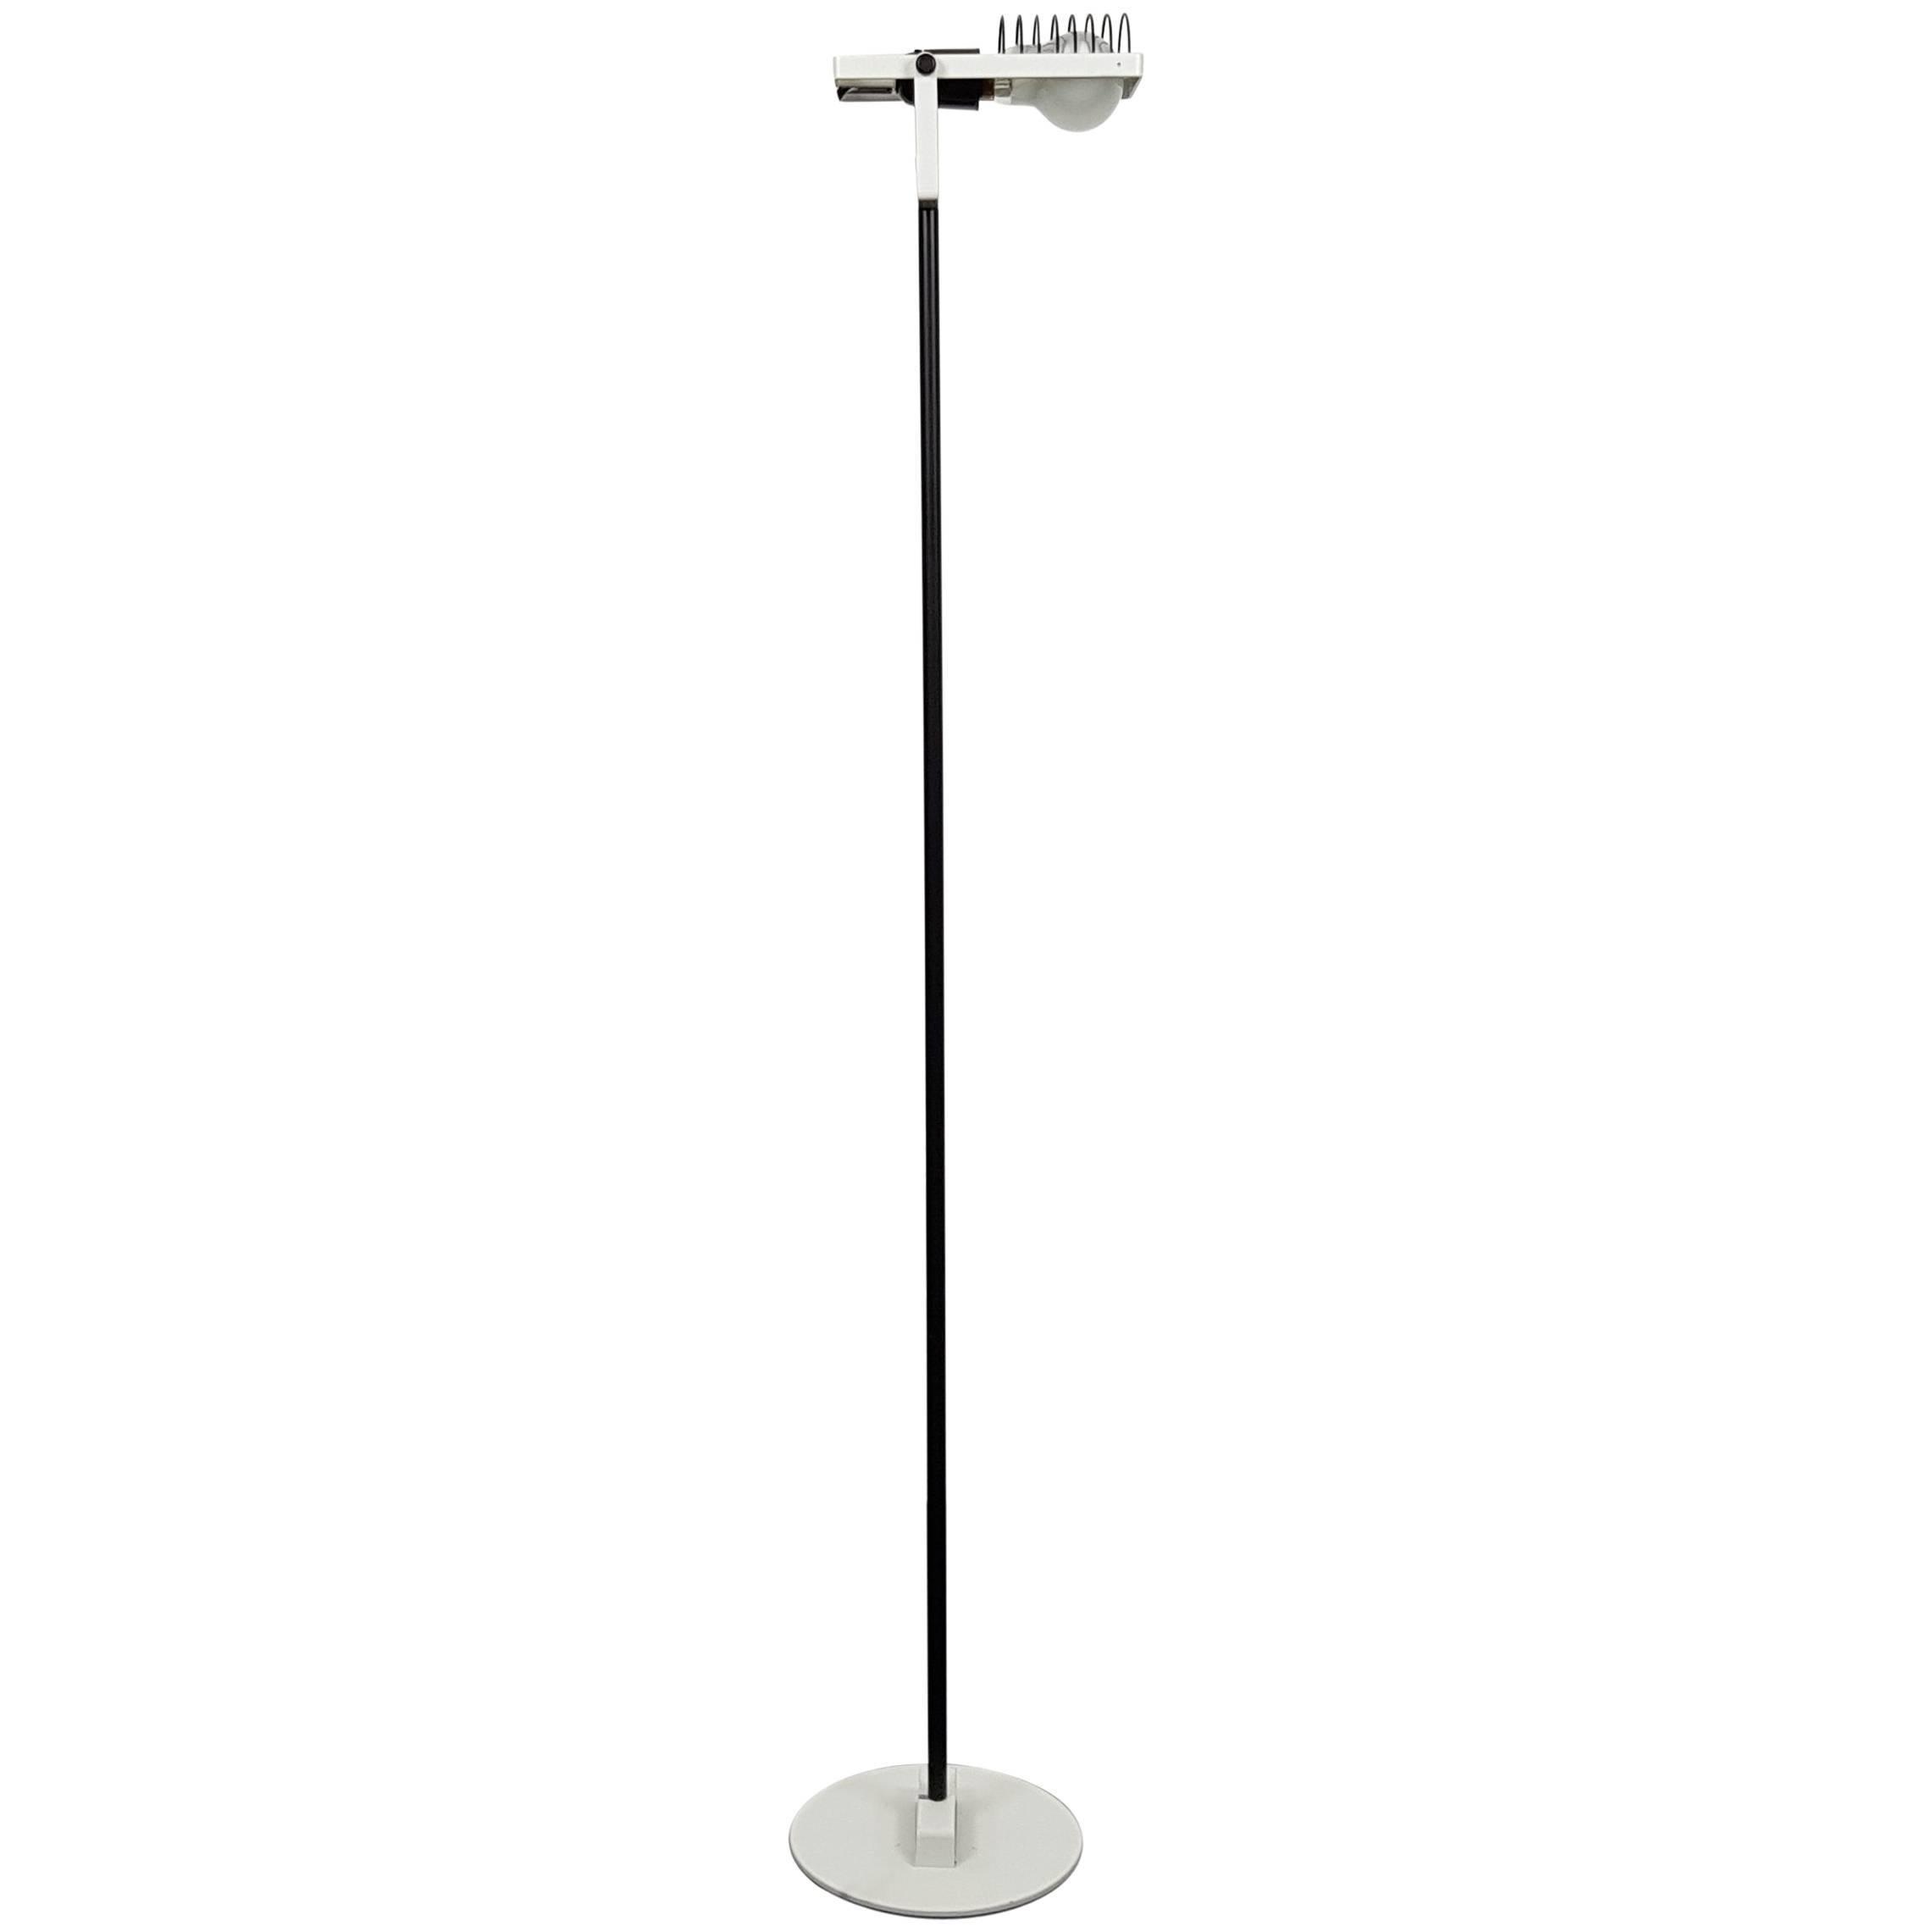 Rare First Edition Ernesto Gismondi Sintesi Terra White Lacquered Floor Lamp